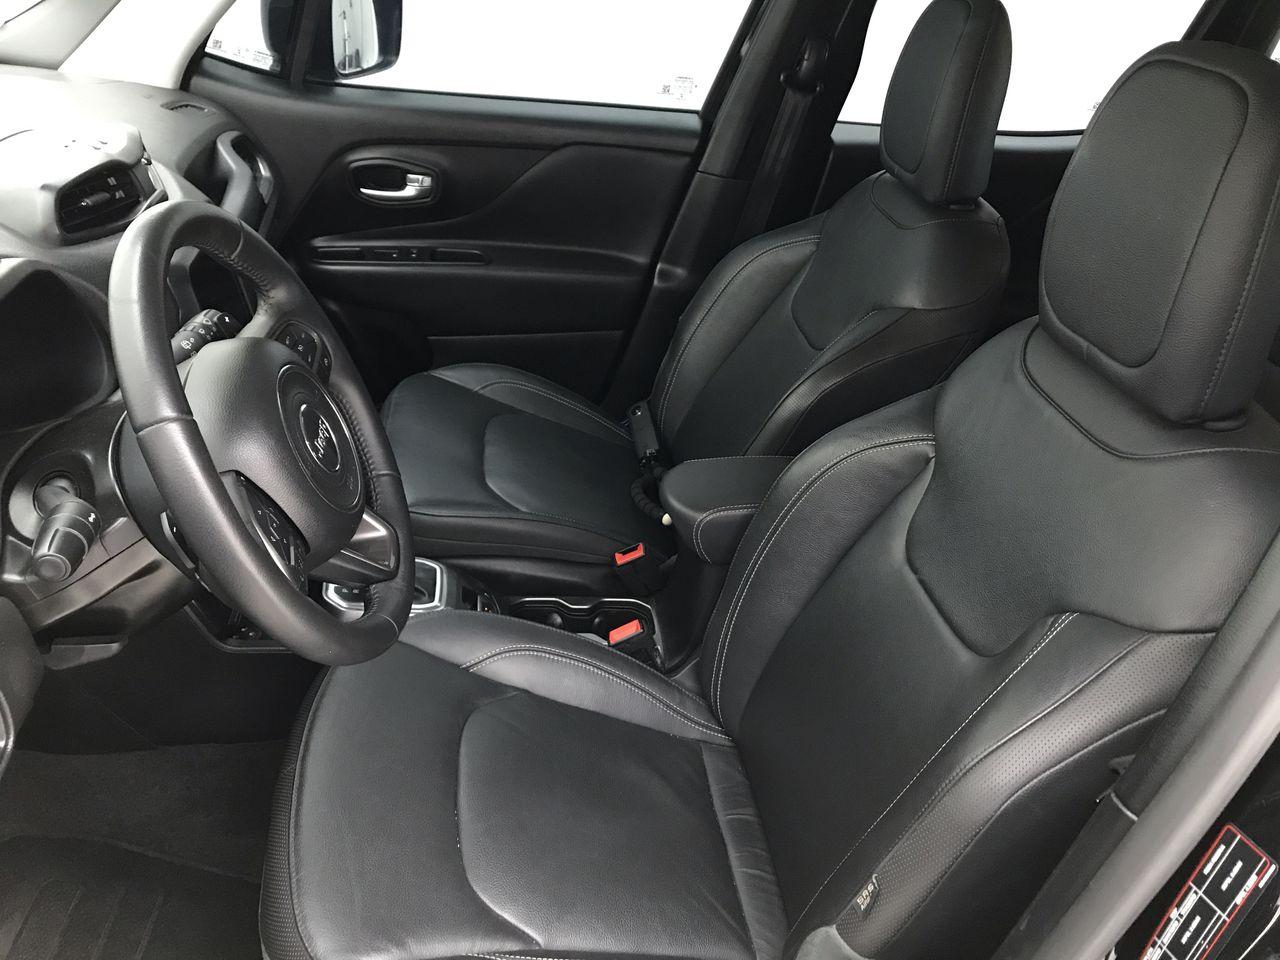 Renegade Limited 1.8 4X2 Flex 16V Aut.